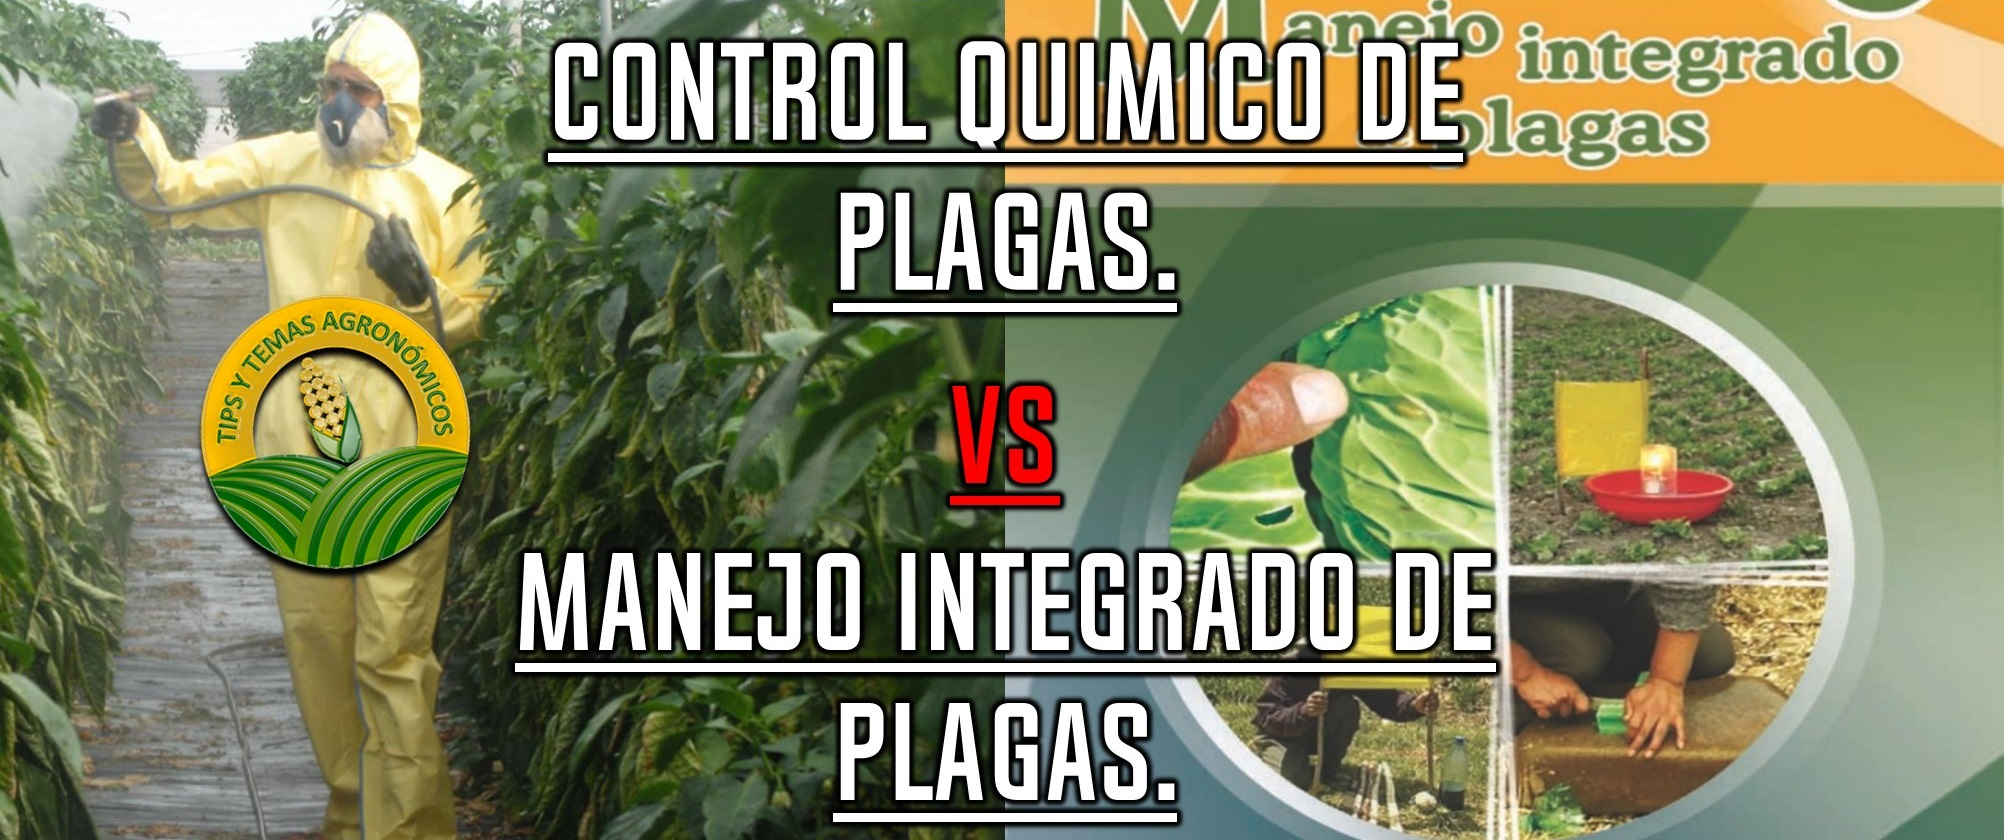 Manejo integrado de plagas vs control qu mico for Control de plagas tenerife